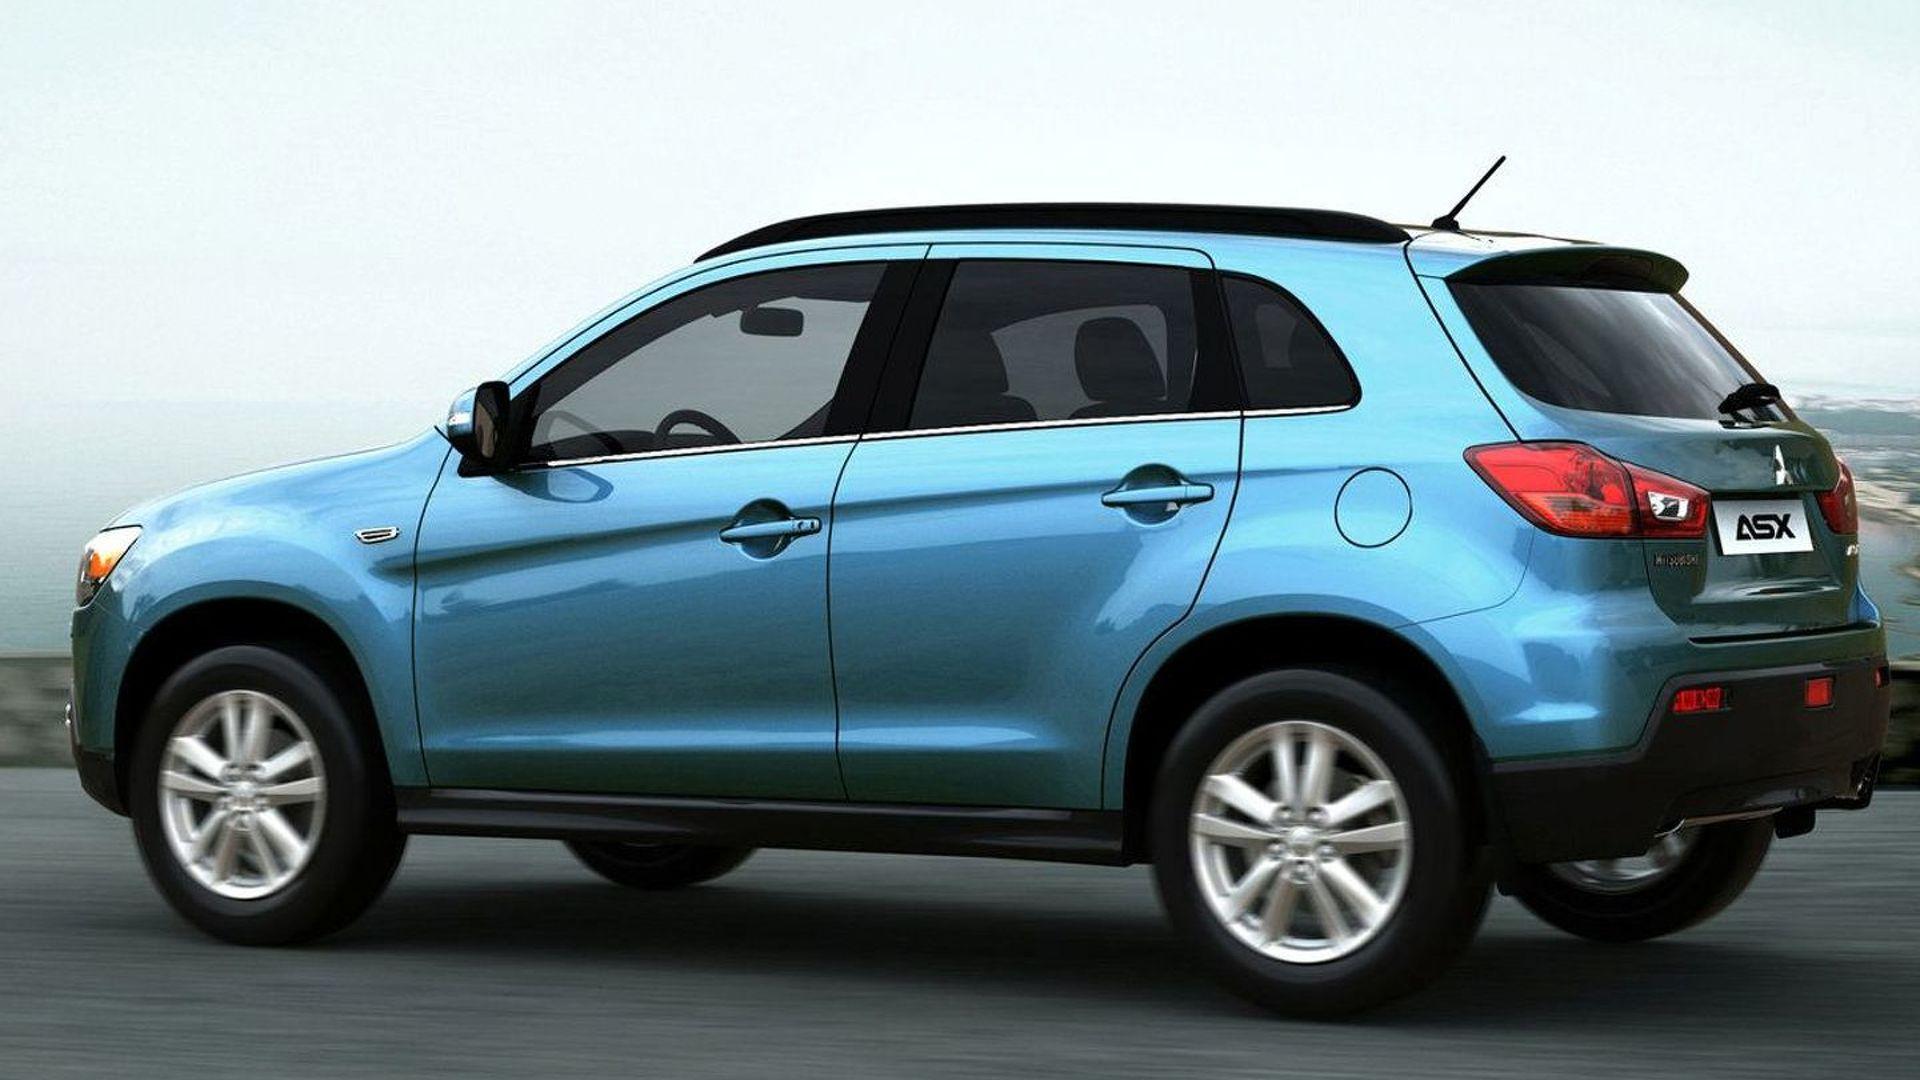 Mitsubishi ASX to Debut at Geneva - European-spec version of the Japanese RVR